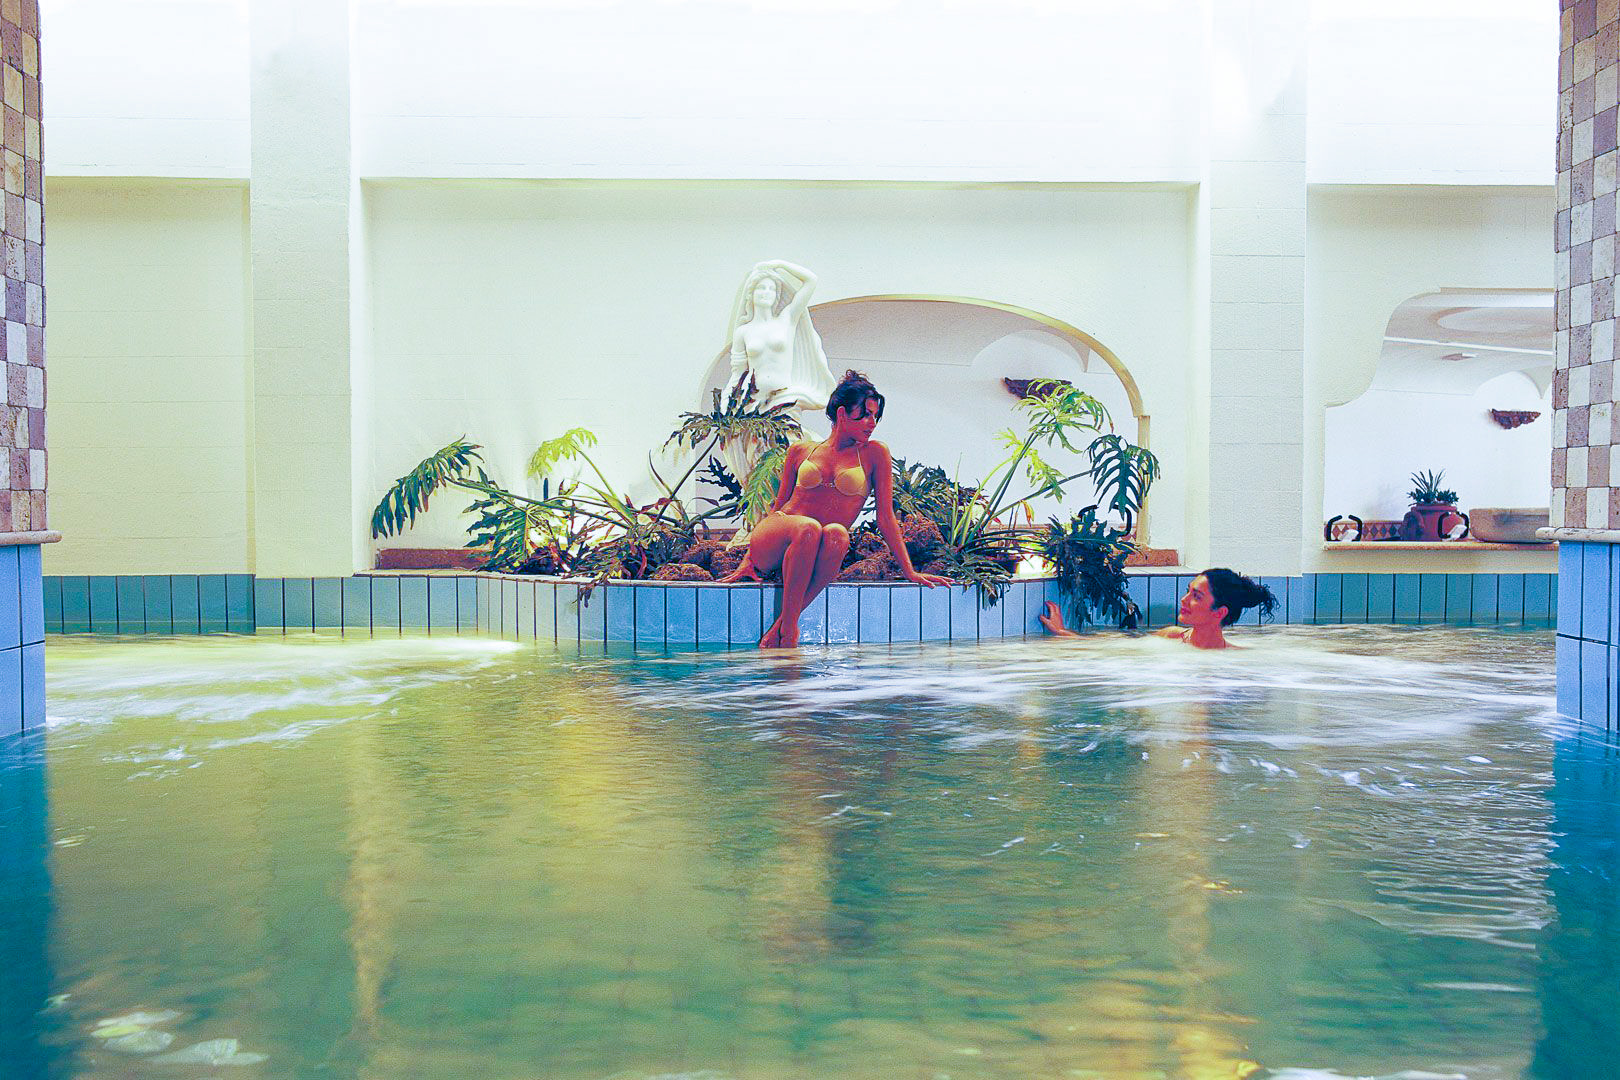 Hotel-Ischia-Grand-Hotel-Terme-di-Augusto-Piscine-06-1620x1080